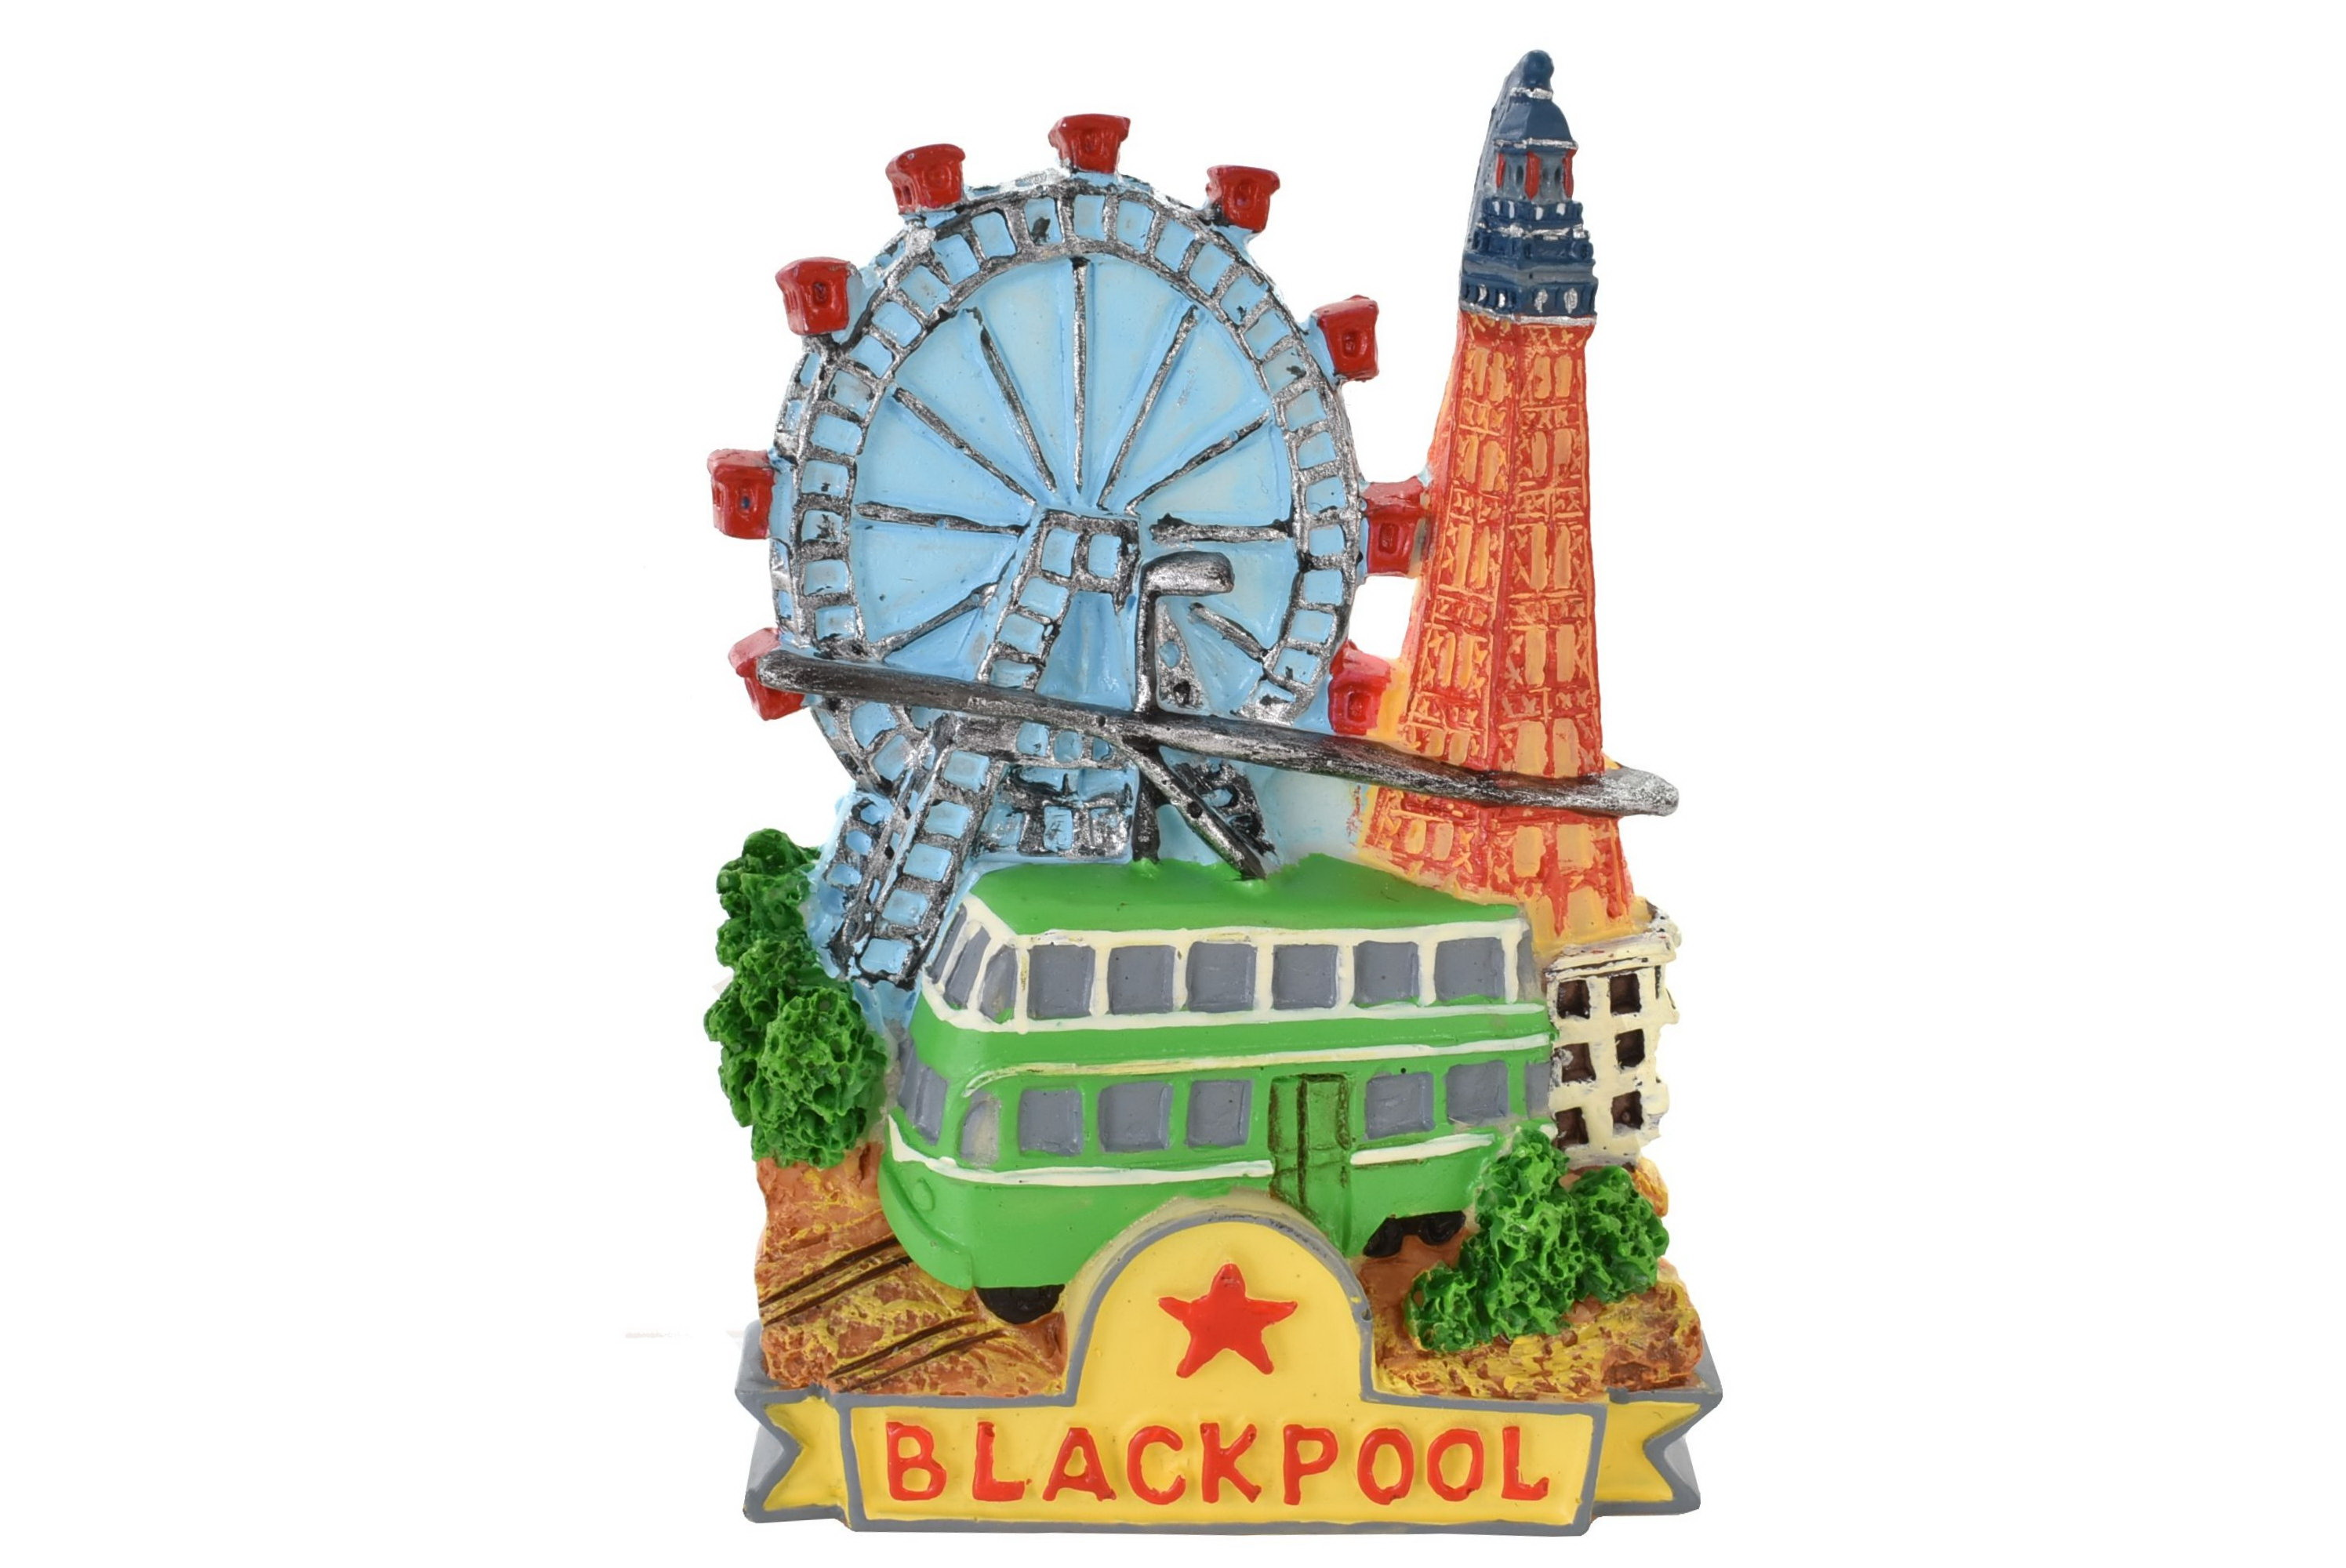 Blackpool Resin Magnet Tower/Tram/Wheel